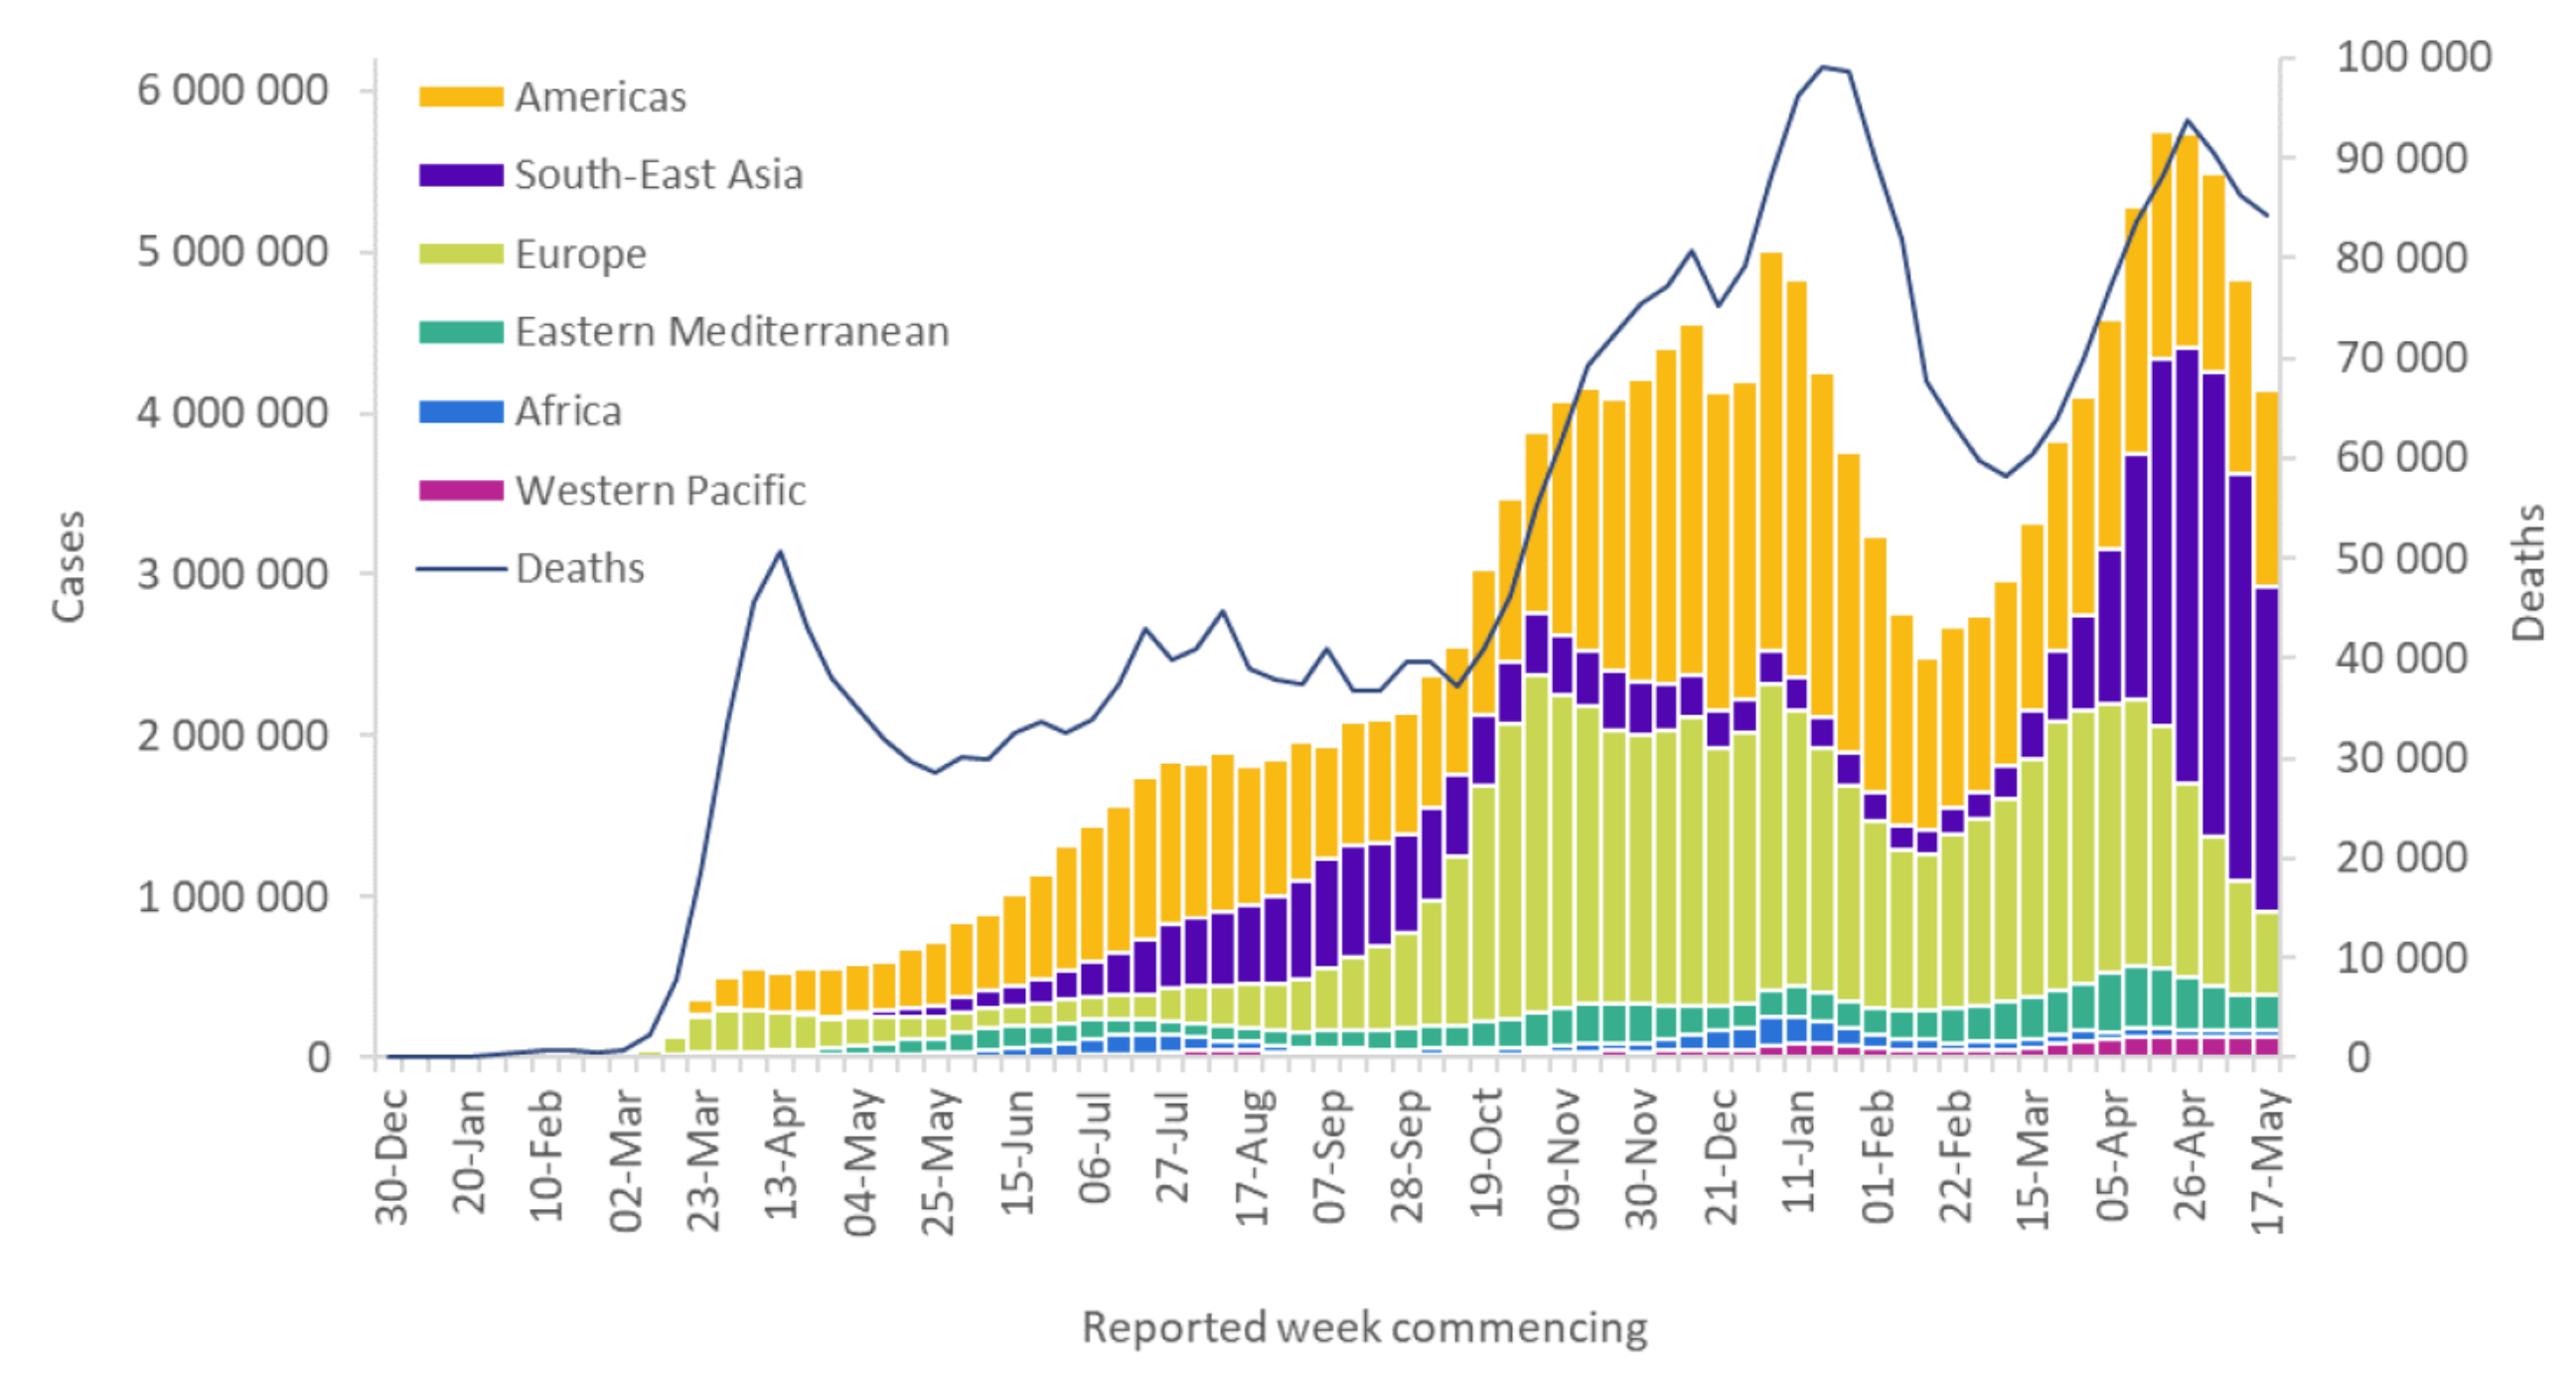 Global Epi Curve for COVID-19 (WHO)